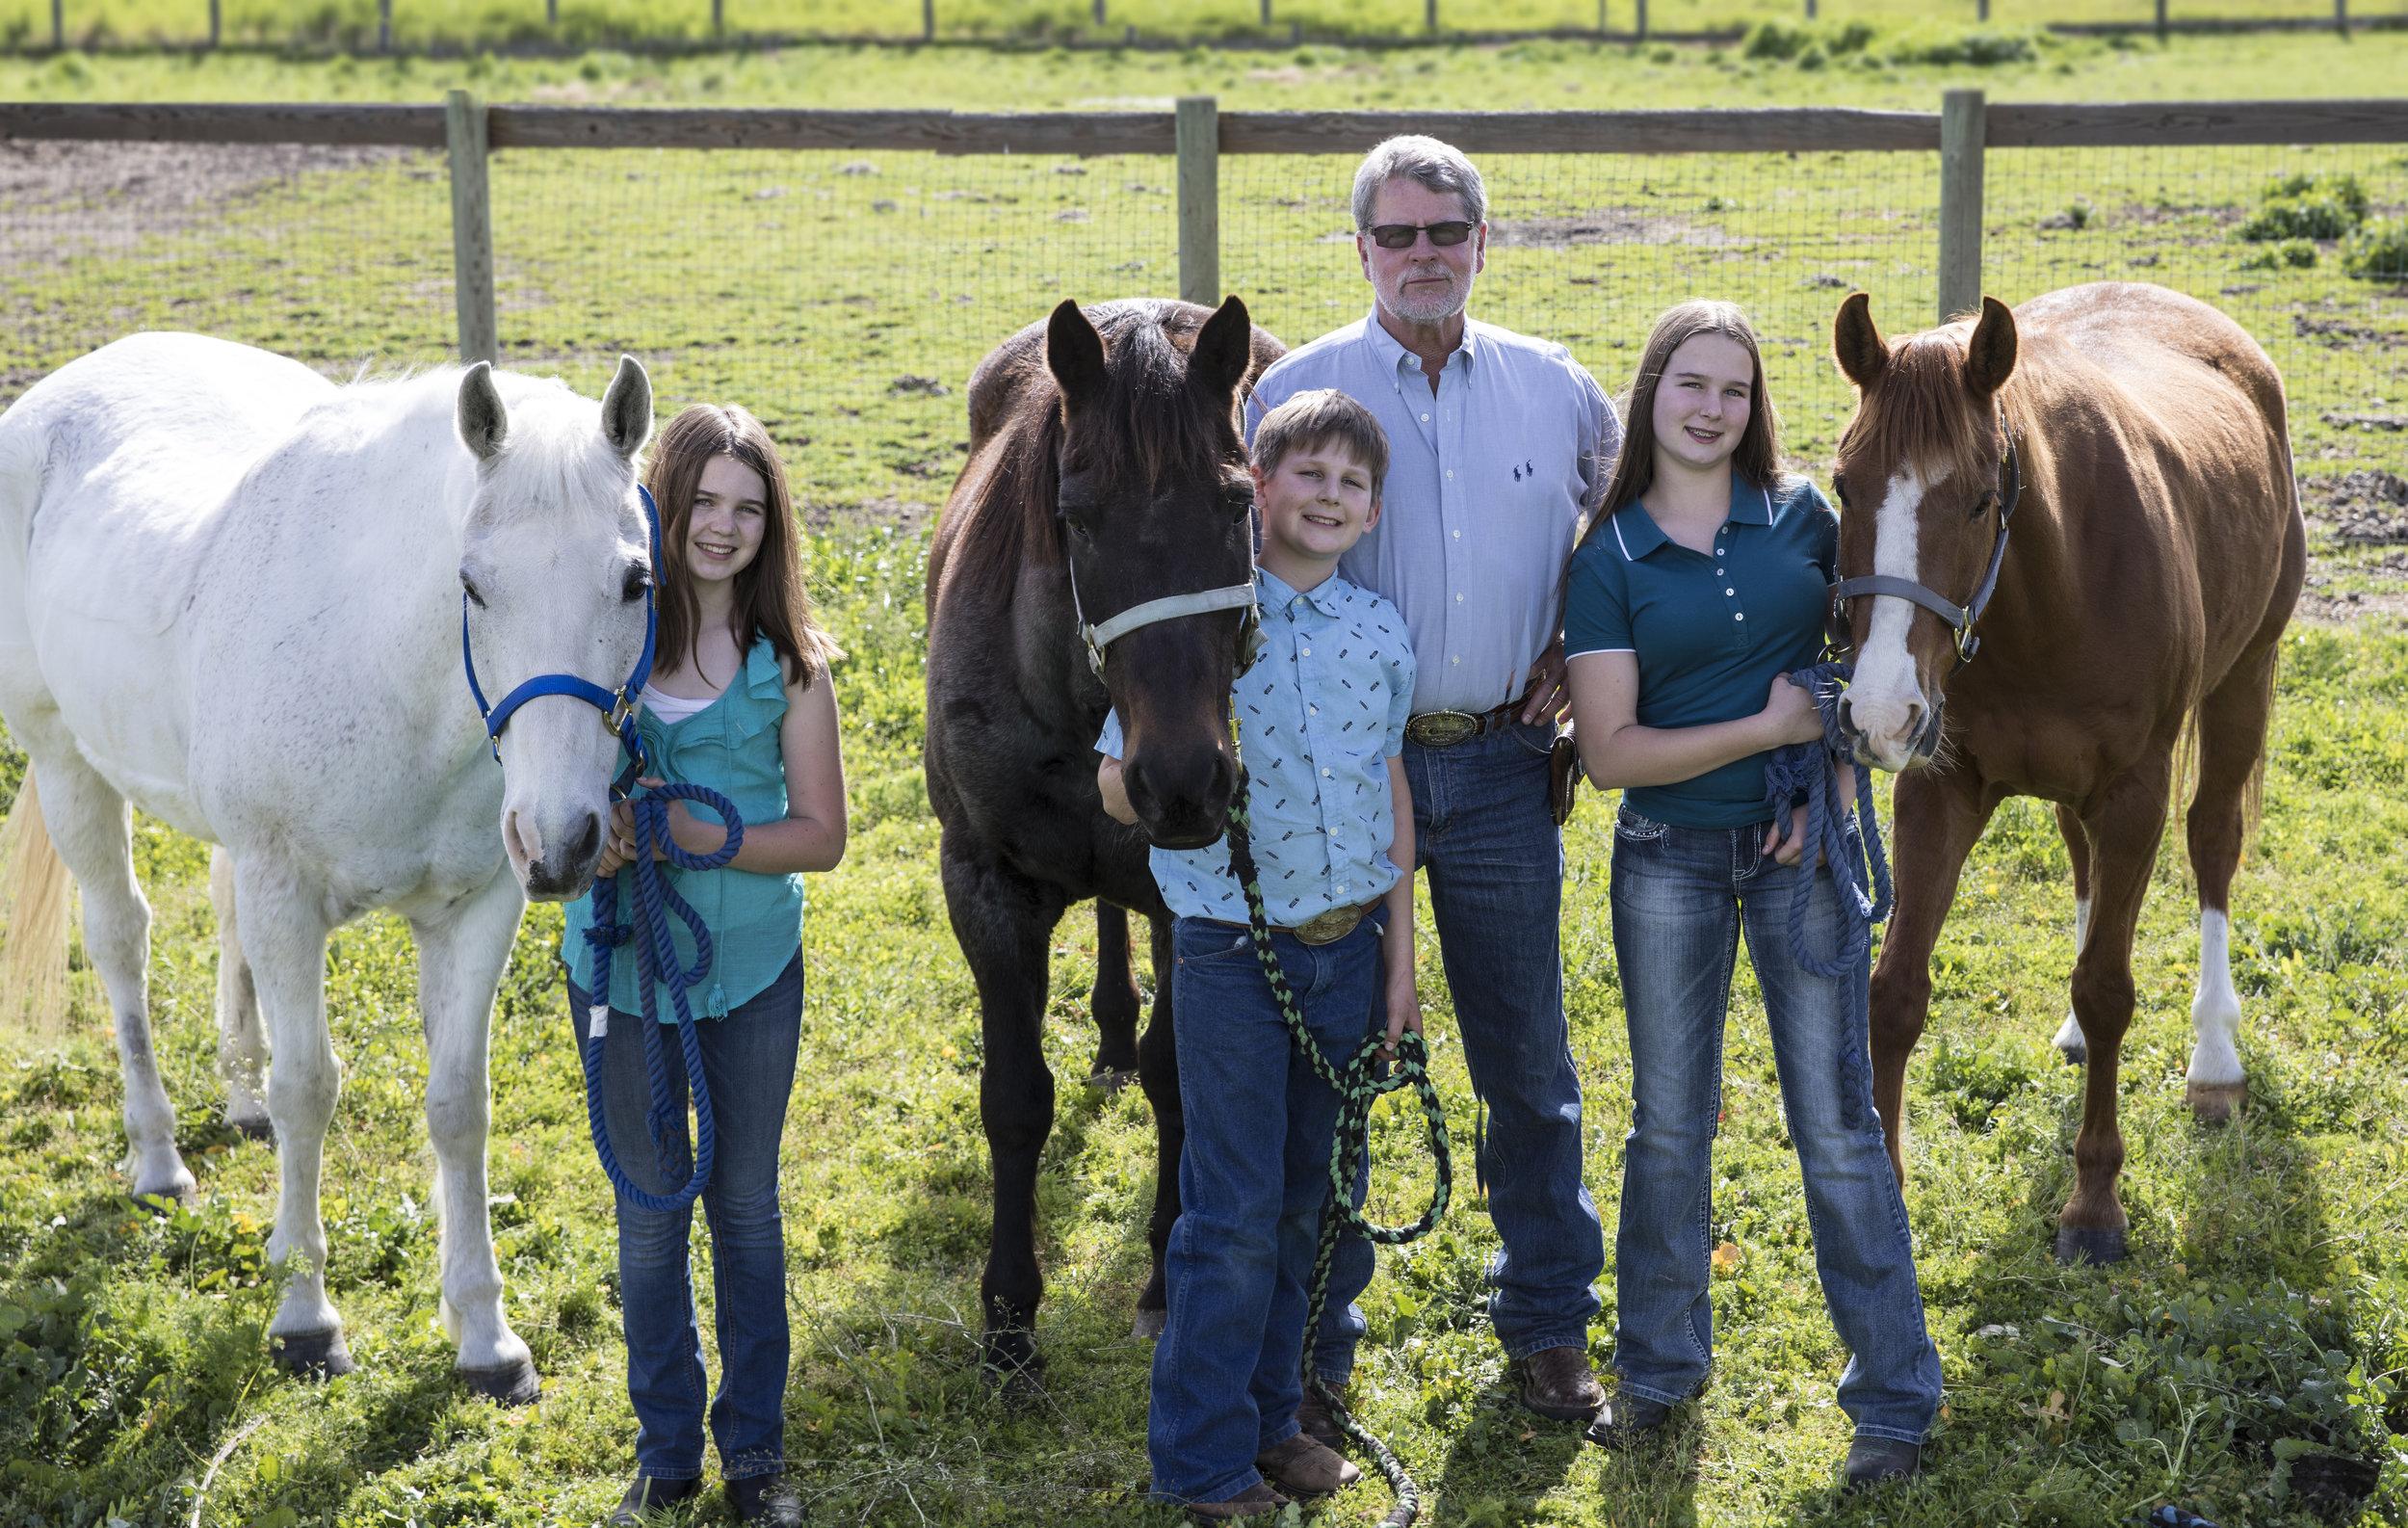 Dr. John Kaufman with his 3 children Juliet, Jake and Jacalyn